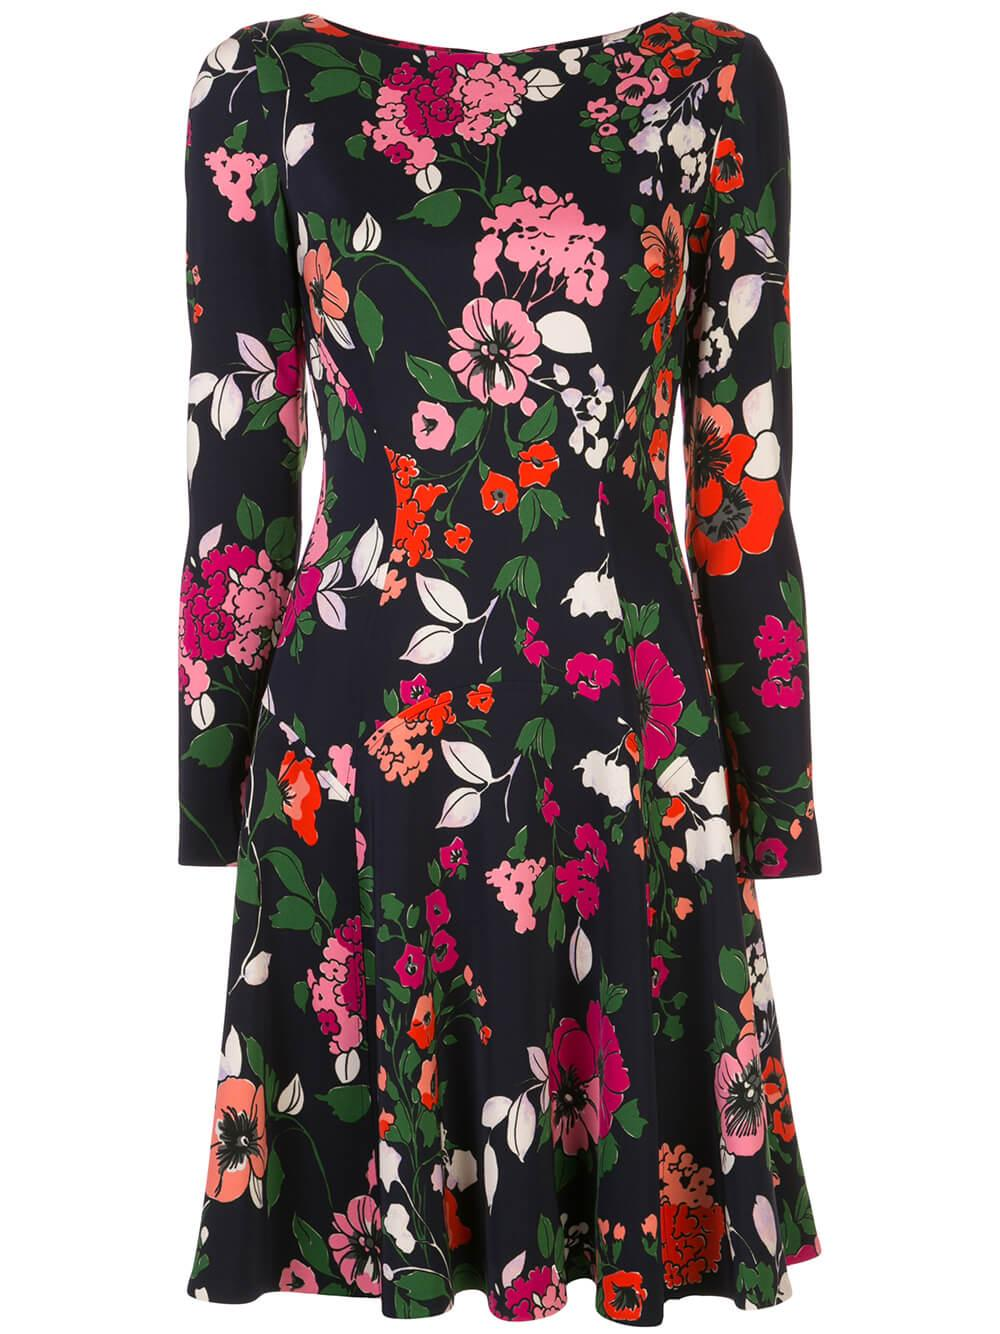 Long Sleeve Floral Printed Crepe Seamed Dress